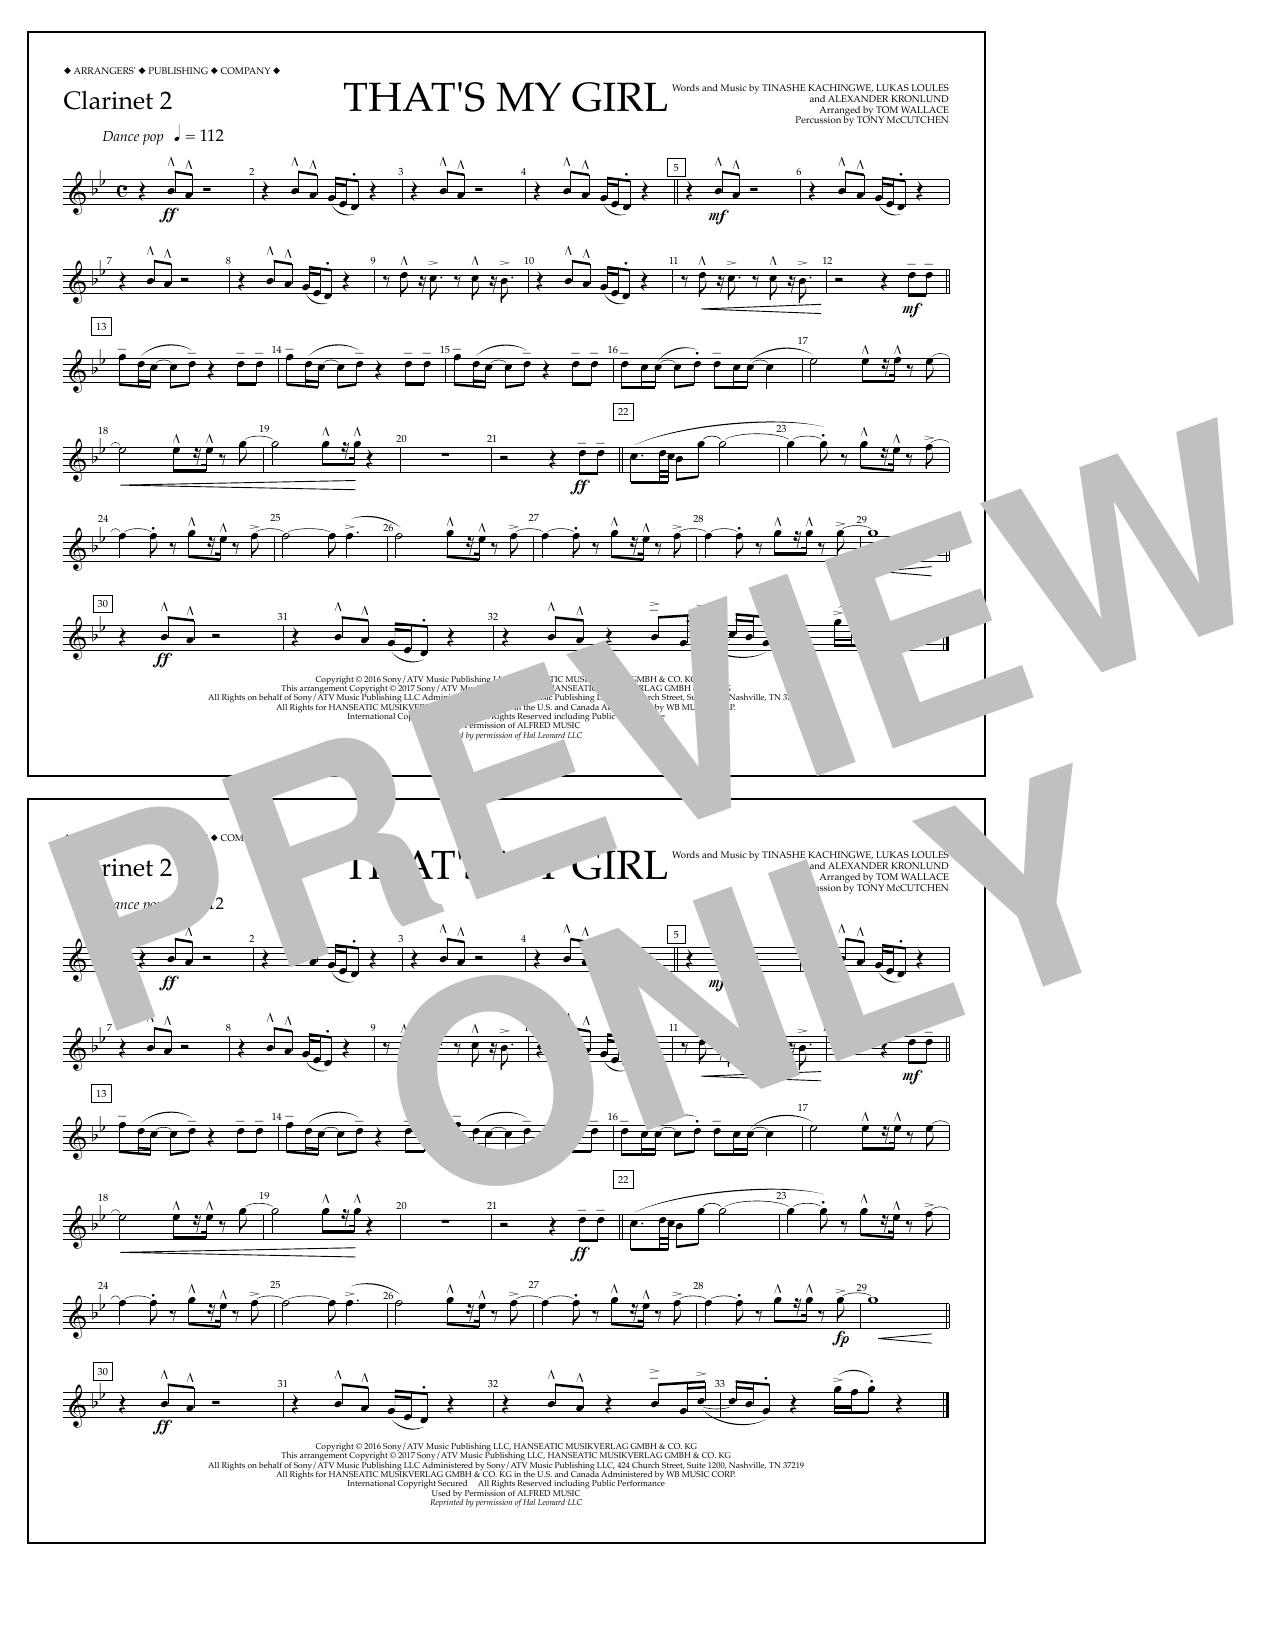 That's My Girl - Clarinet 2 Sheet Music